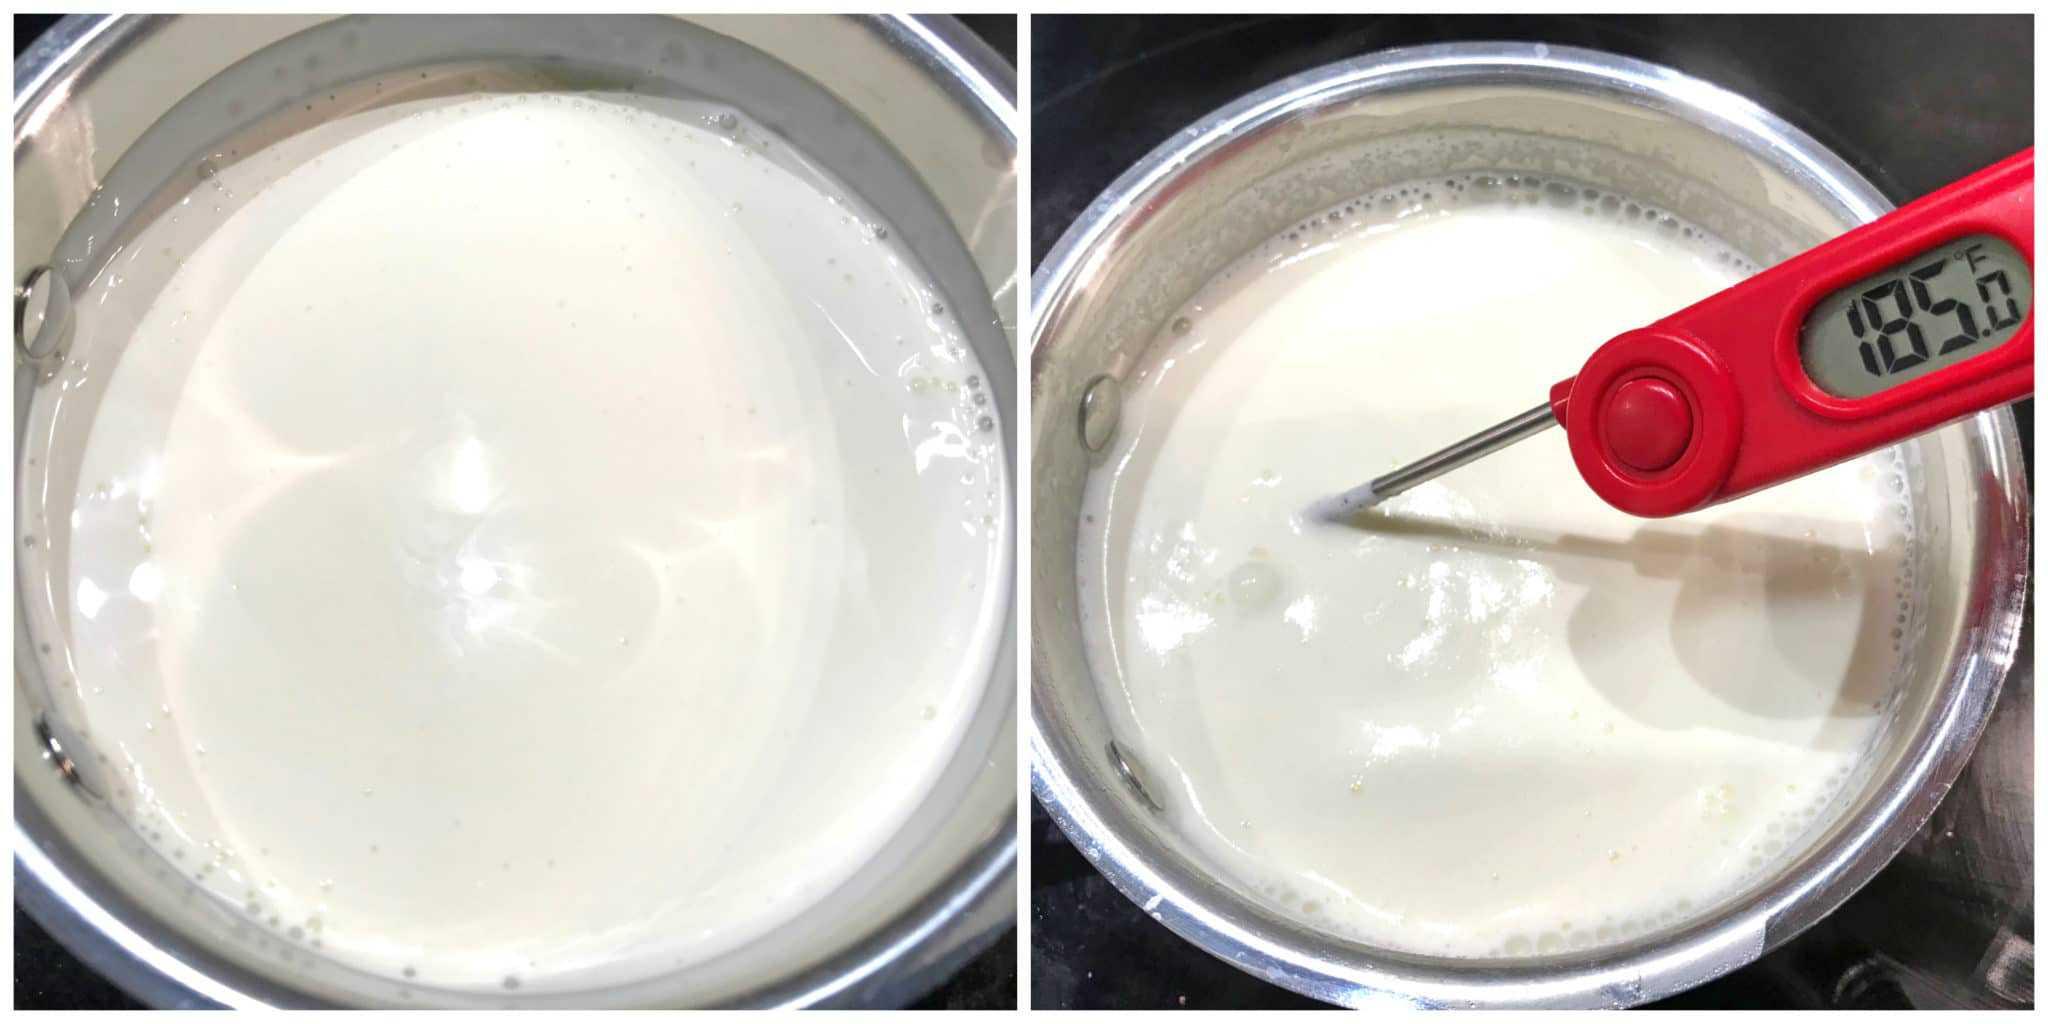 heating whipping cream